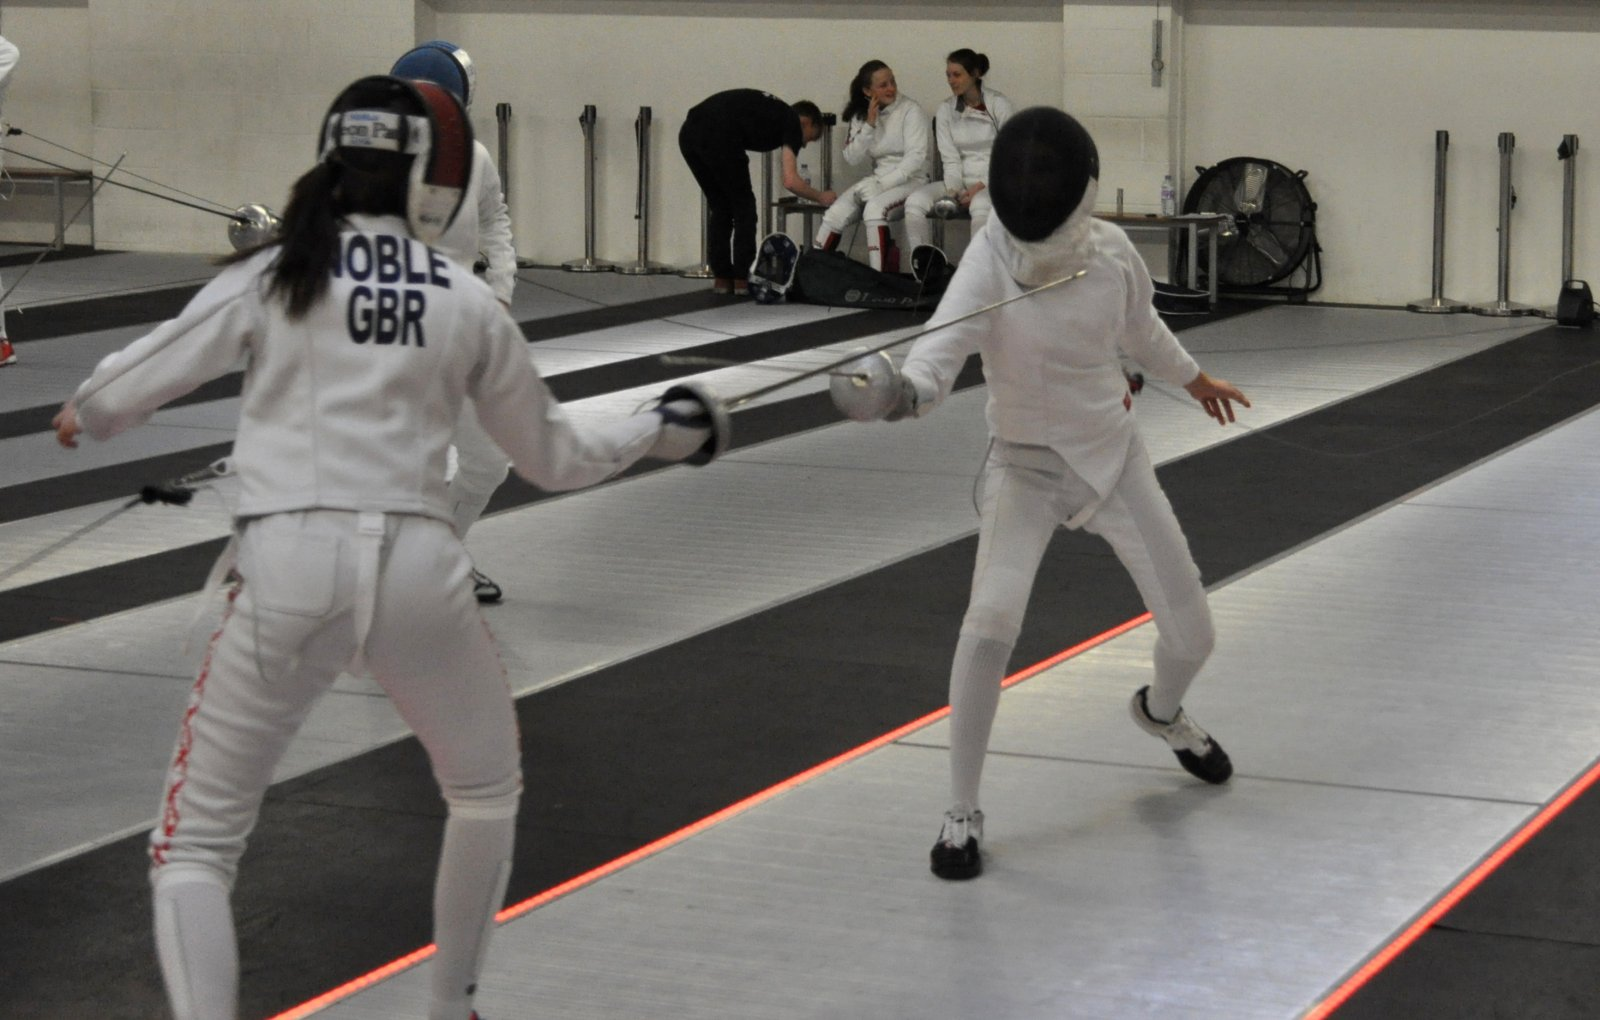 Leicester-Shire & Rutland Sport - Niamh Rebecca Noble